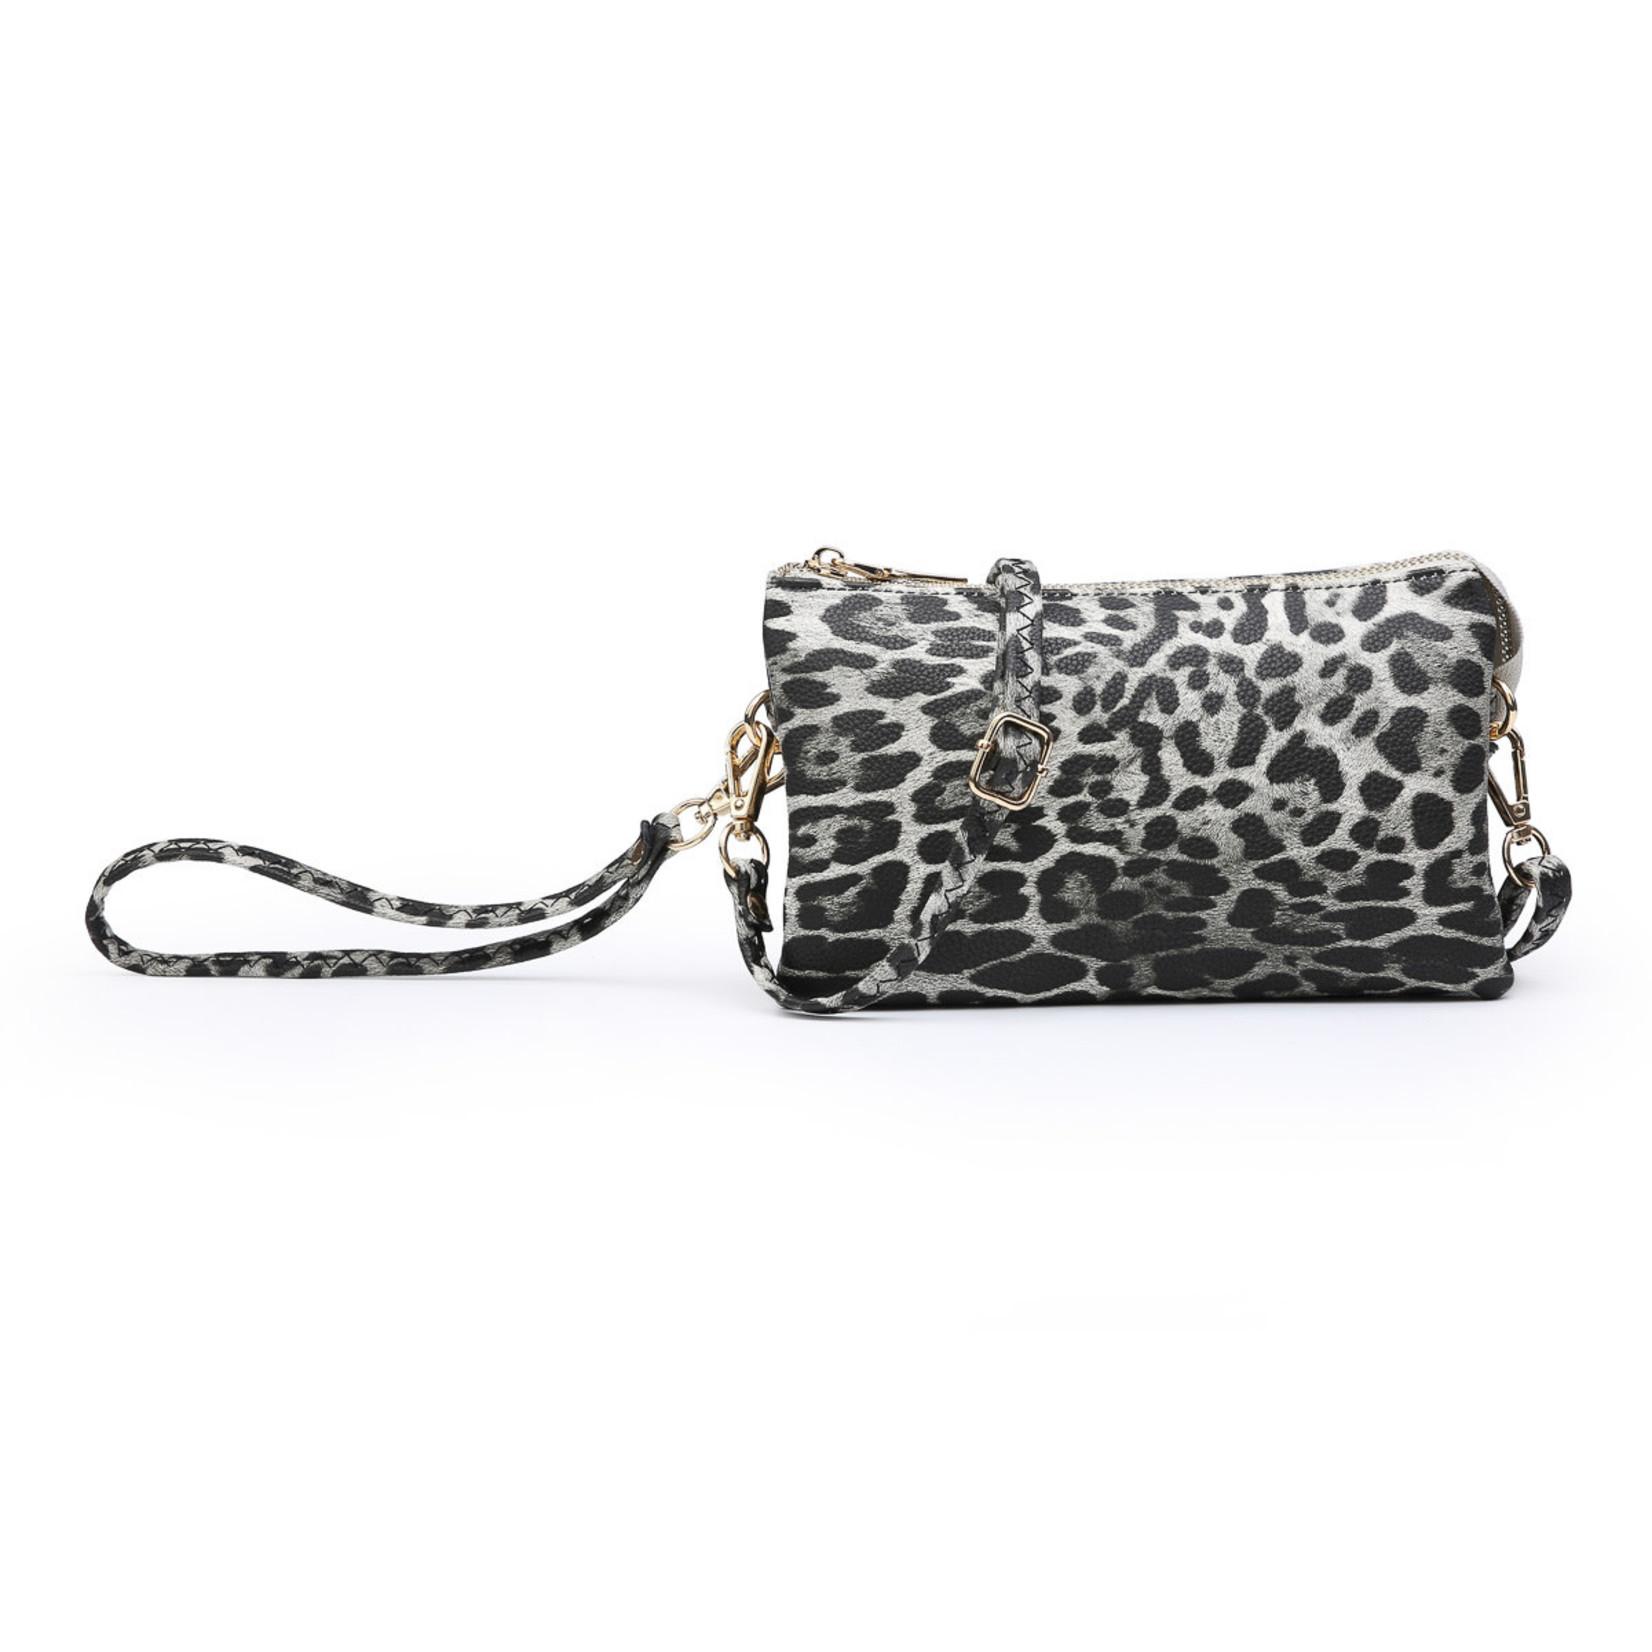 Riley Vegan Lthr Dbl Sided Wristlet/Crossbody - Cheetah Grey